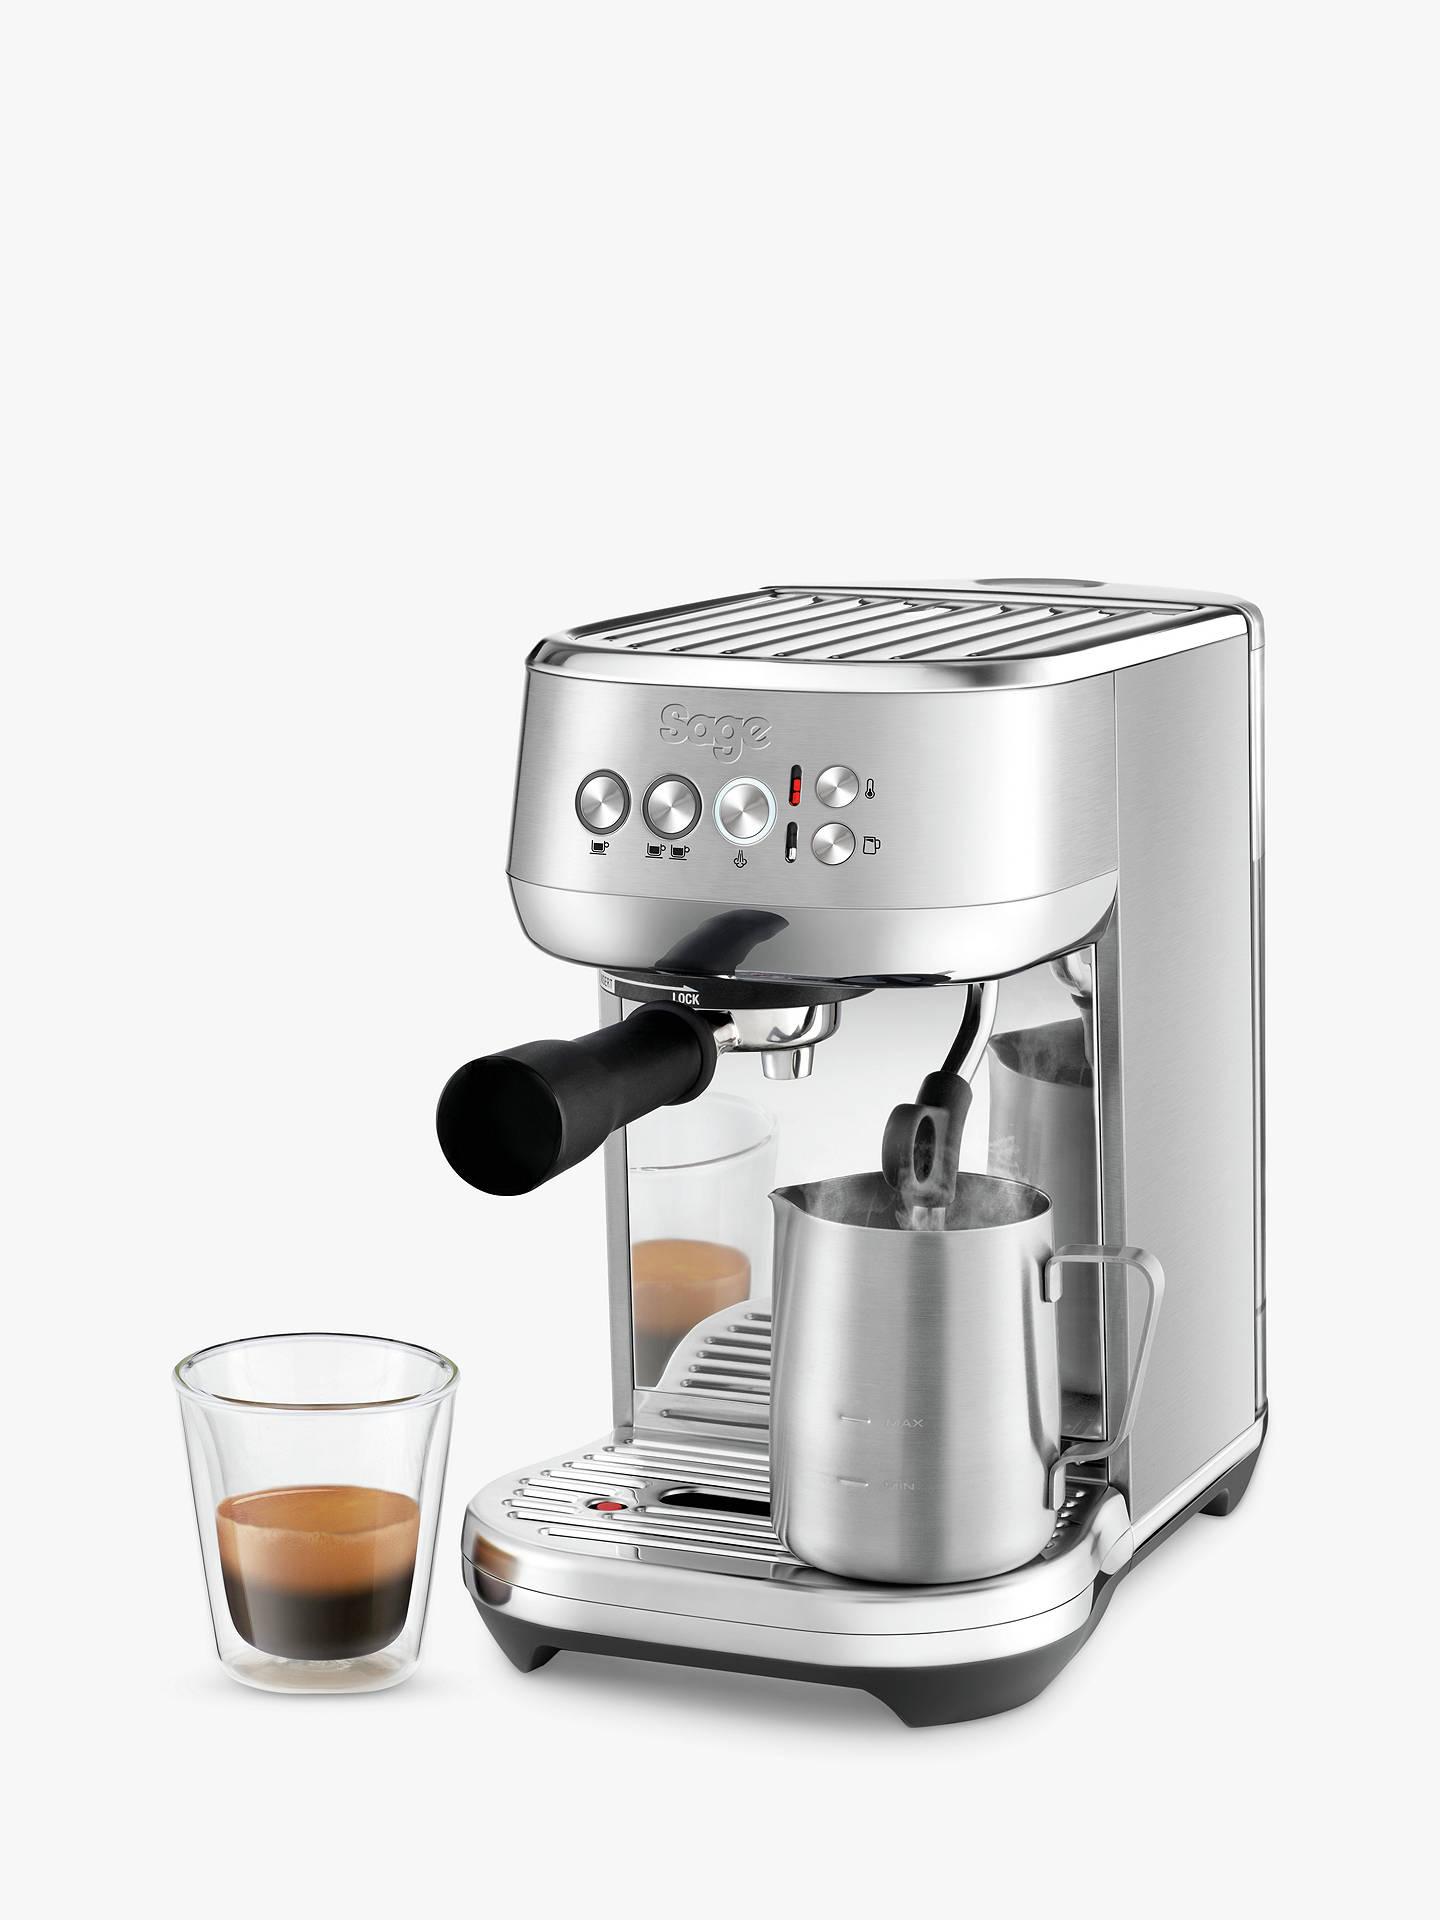 Sage Ses500bss Bambino Plus Coffee Machine Silver